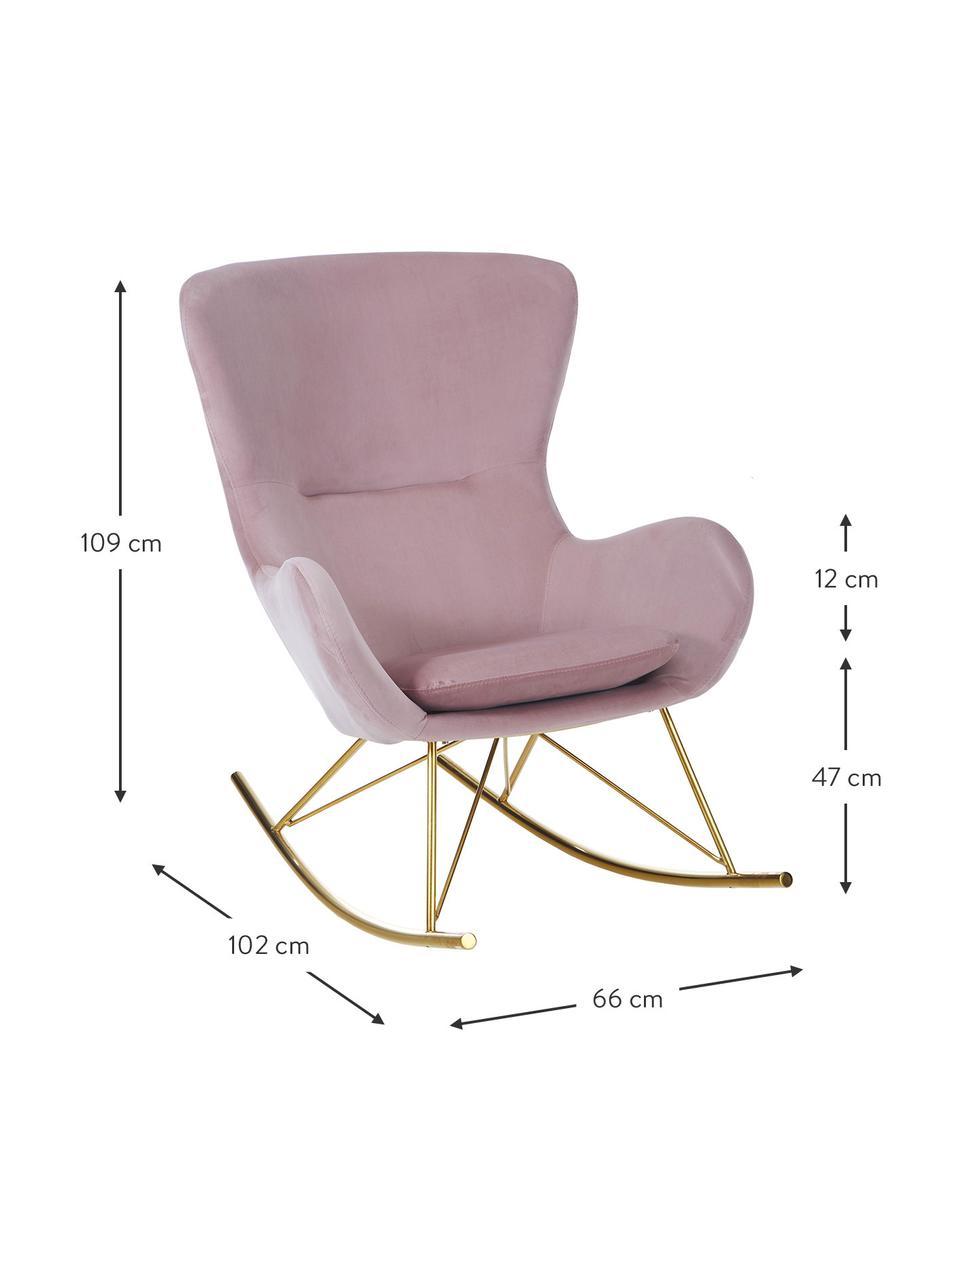 Samt-Schaukelstuhl Wing in Rosa mit Metall-Füßen, Bezug: Samt (Polyester) Der Bezu, Gestell: Metall, galvanisiert, Samt Rosa, Goldfarben, B 76 x T 108 cm